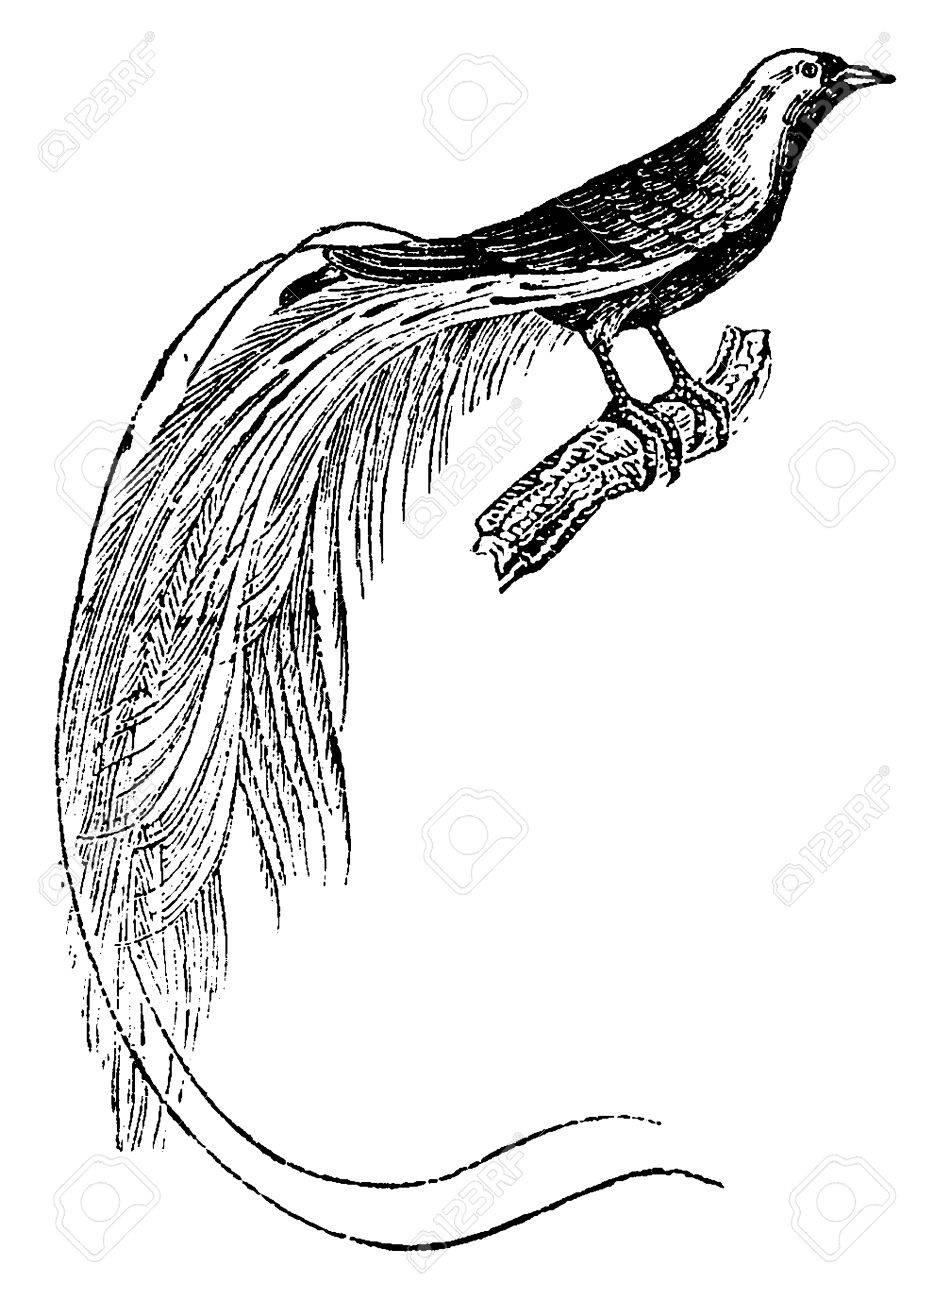 bird of paradise vintage engraved illustration natural history